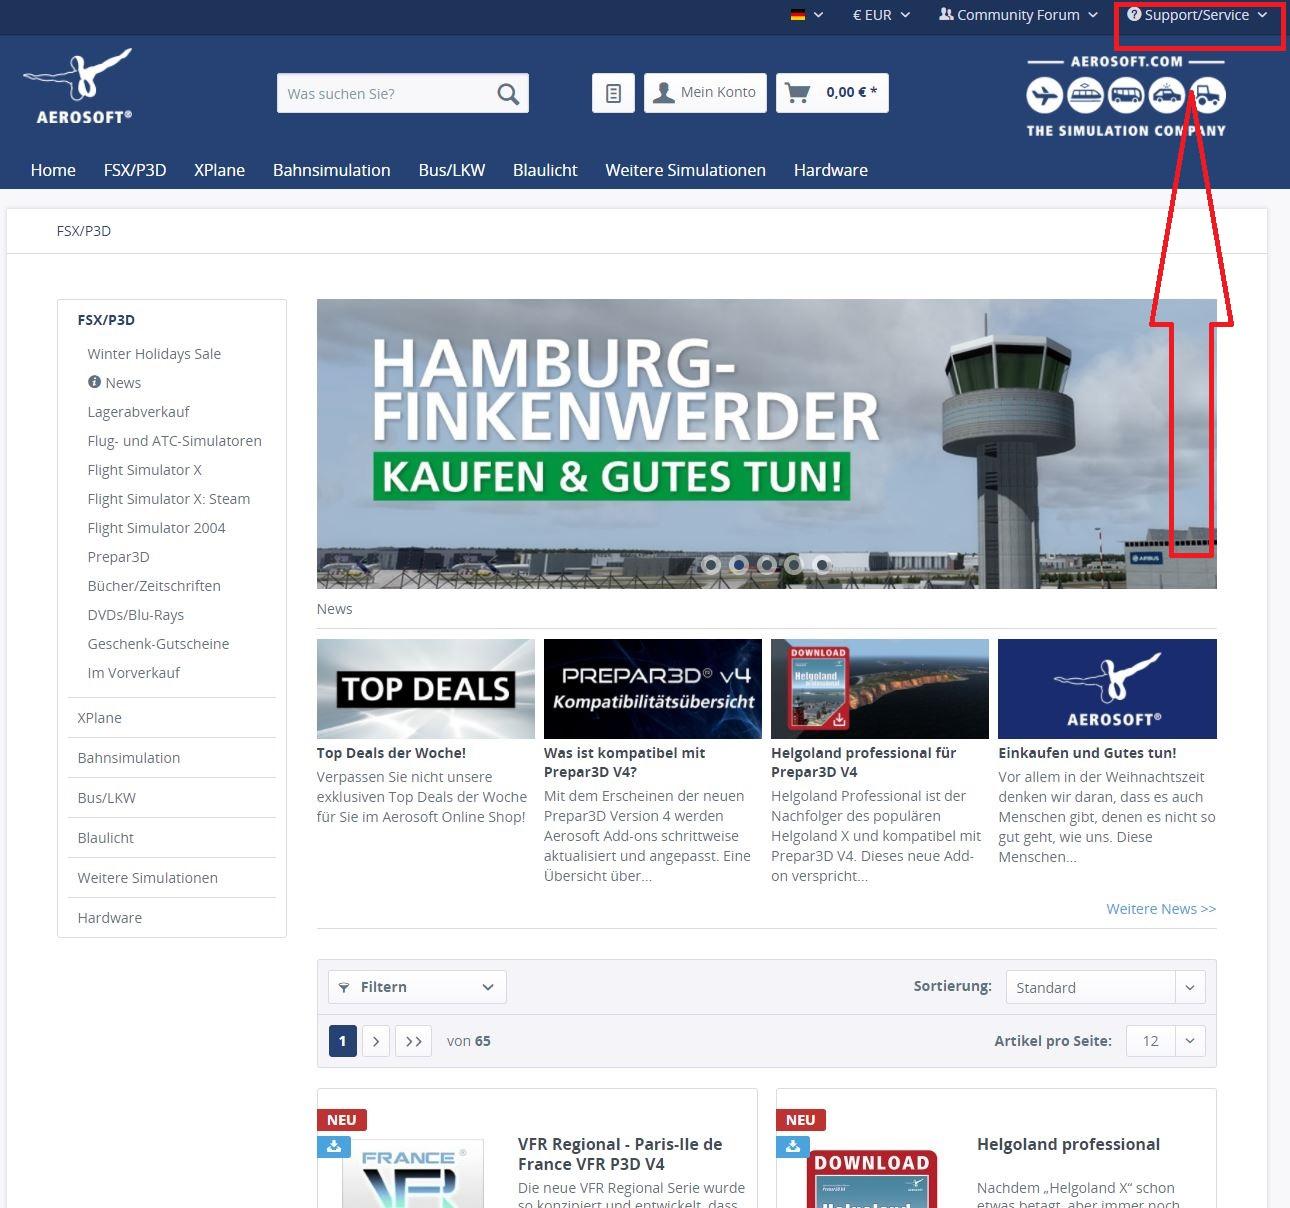 Fly Tampa Vienna - Aerosoft Mega Airports - AEROSOFT COMMUNITY SERVICES